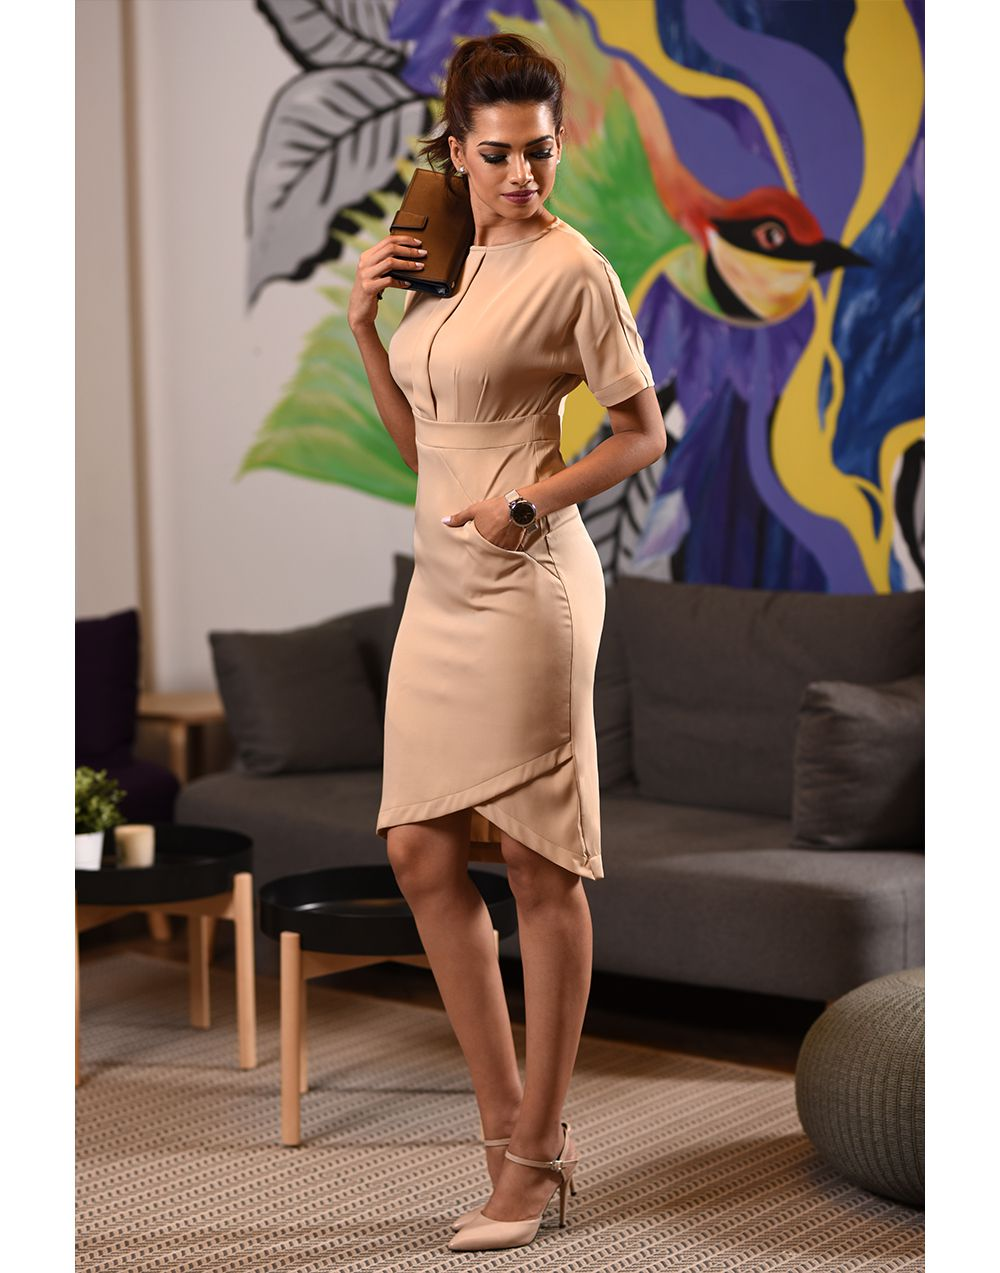 Bossy Girl Power WW Dress